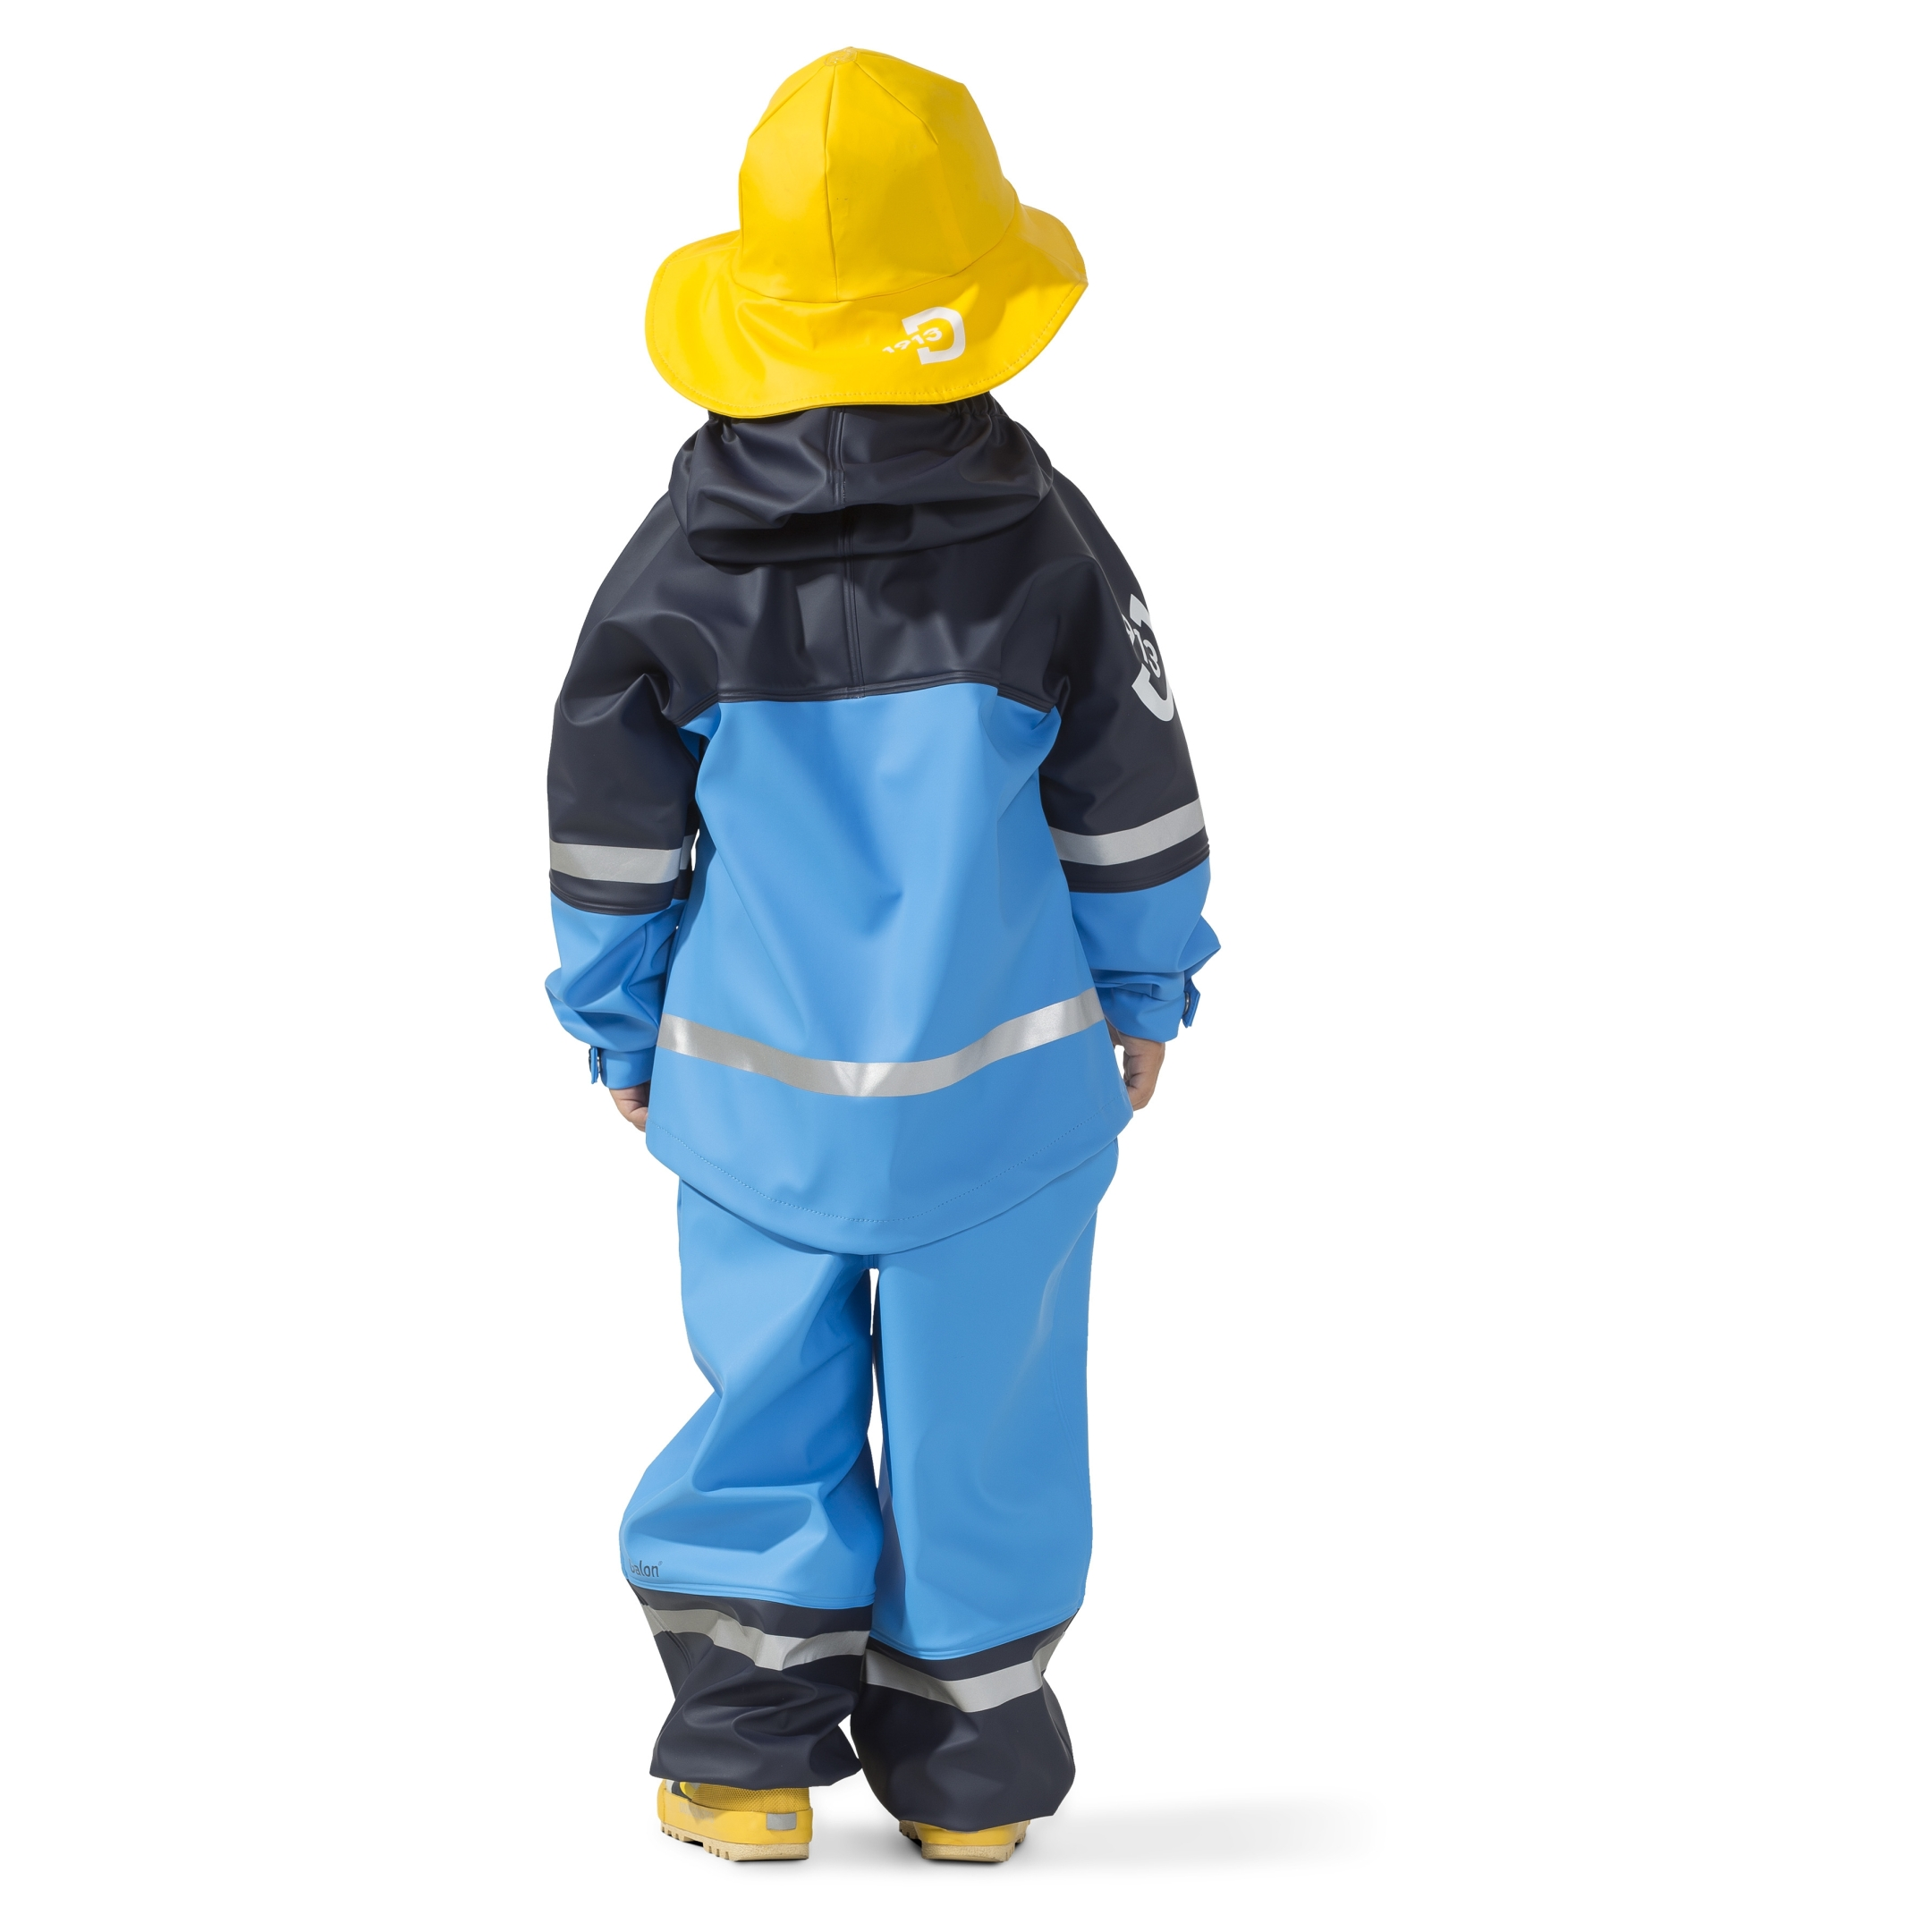 Дидриксон детский костюм дождевой WATERMAN + средство для стирки, - фото 2